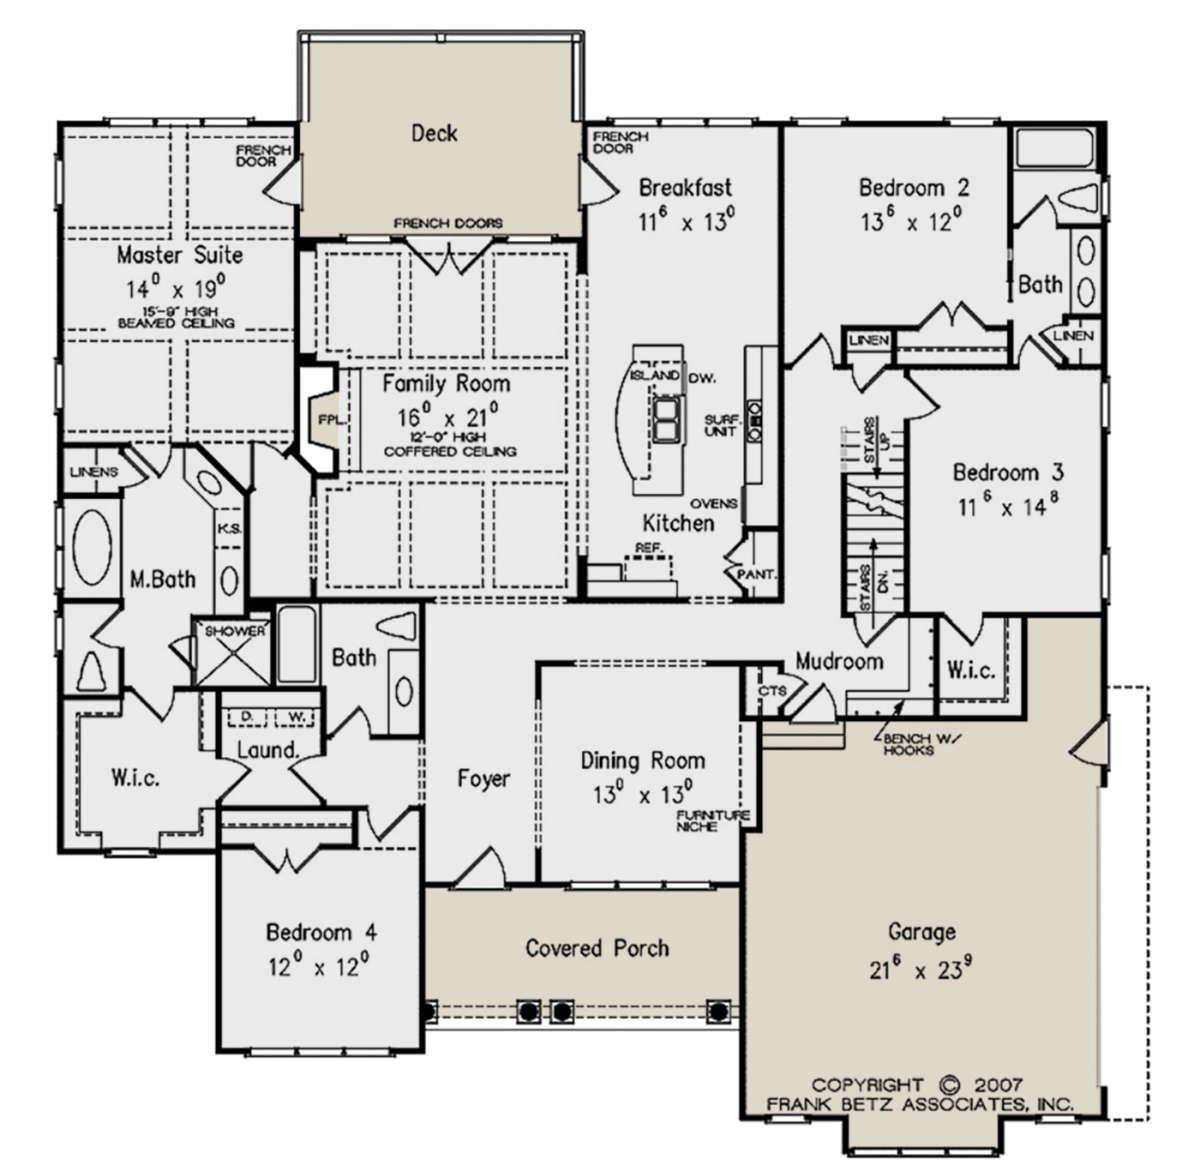 House Plan 8594 00229 Traditional Plan 2 645 Square Feet 4 Bedrooms 3 Bathrooms In 2021 House Floor Plans House Plans How To Plan